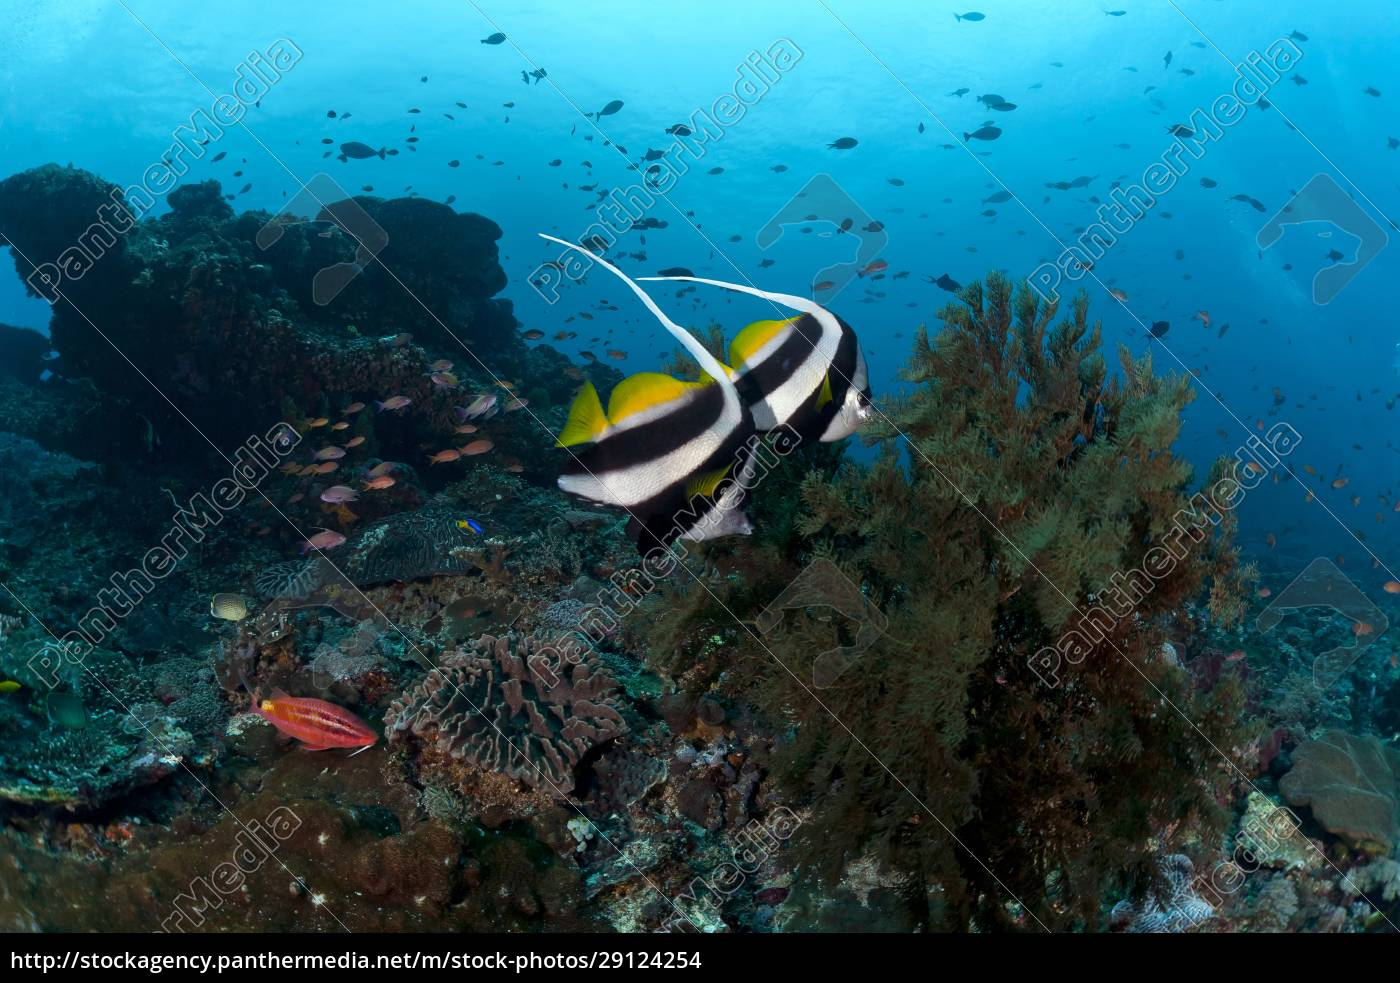 indonesien, bali, nusa, lembongan, langflossen-bannerfisch, heniochus, acuminatus - 29124254